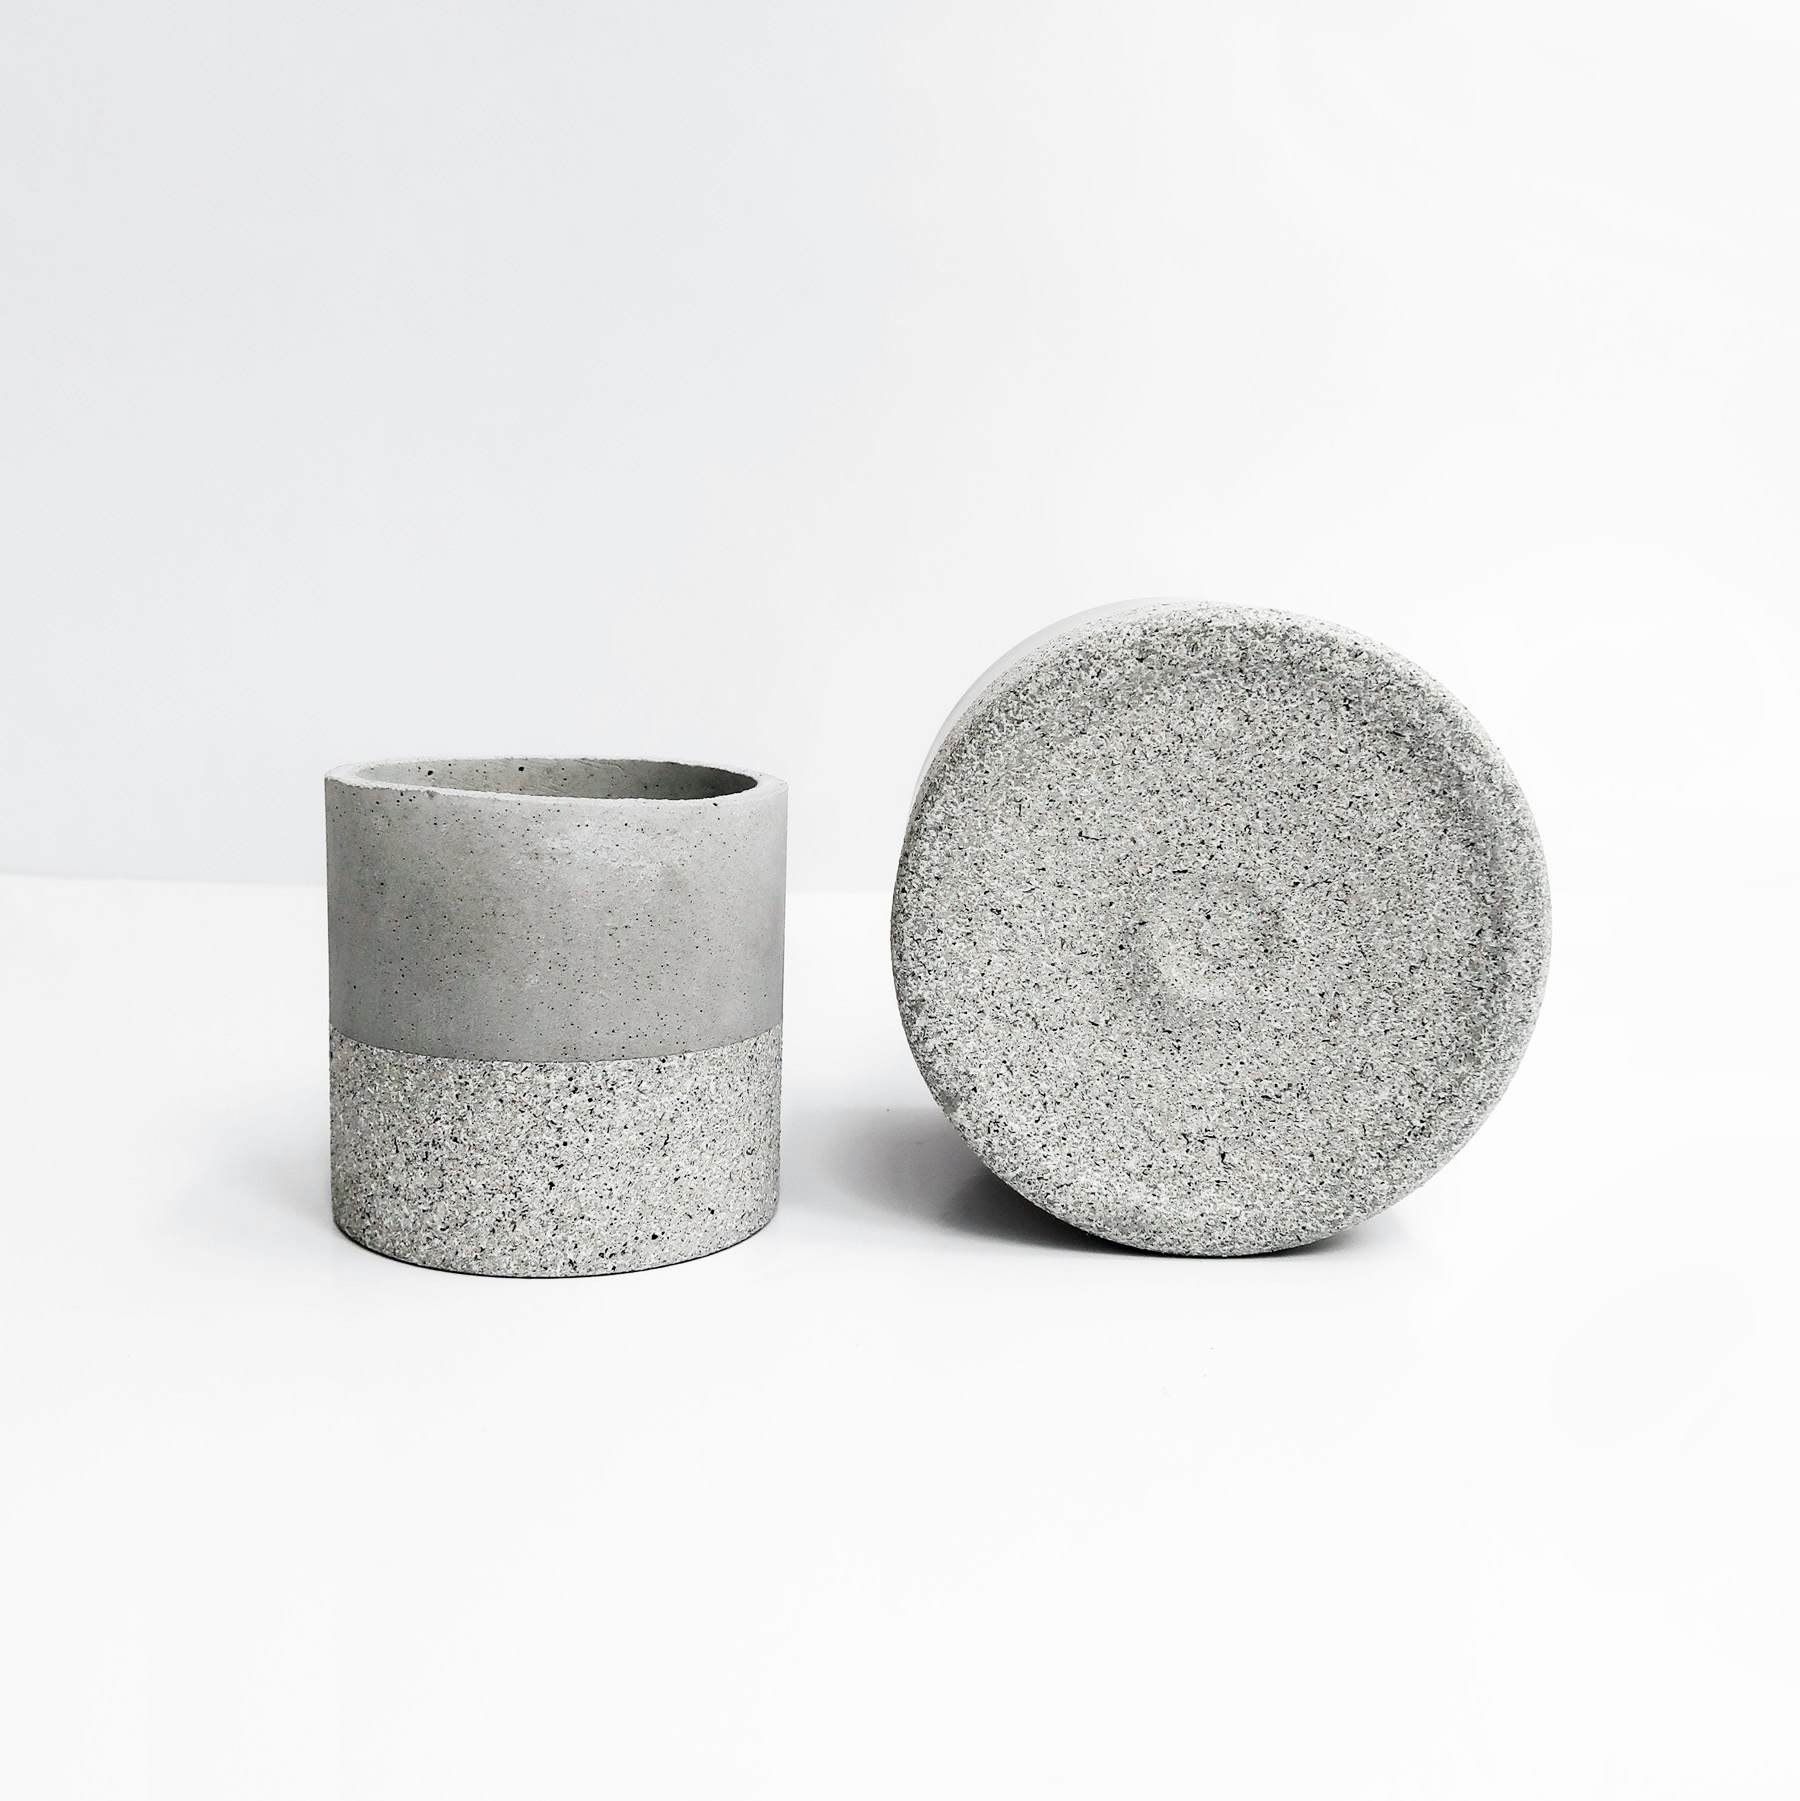 GRANITE 花崗岩深圓水泥設計家飾・盆器・盆栽